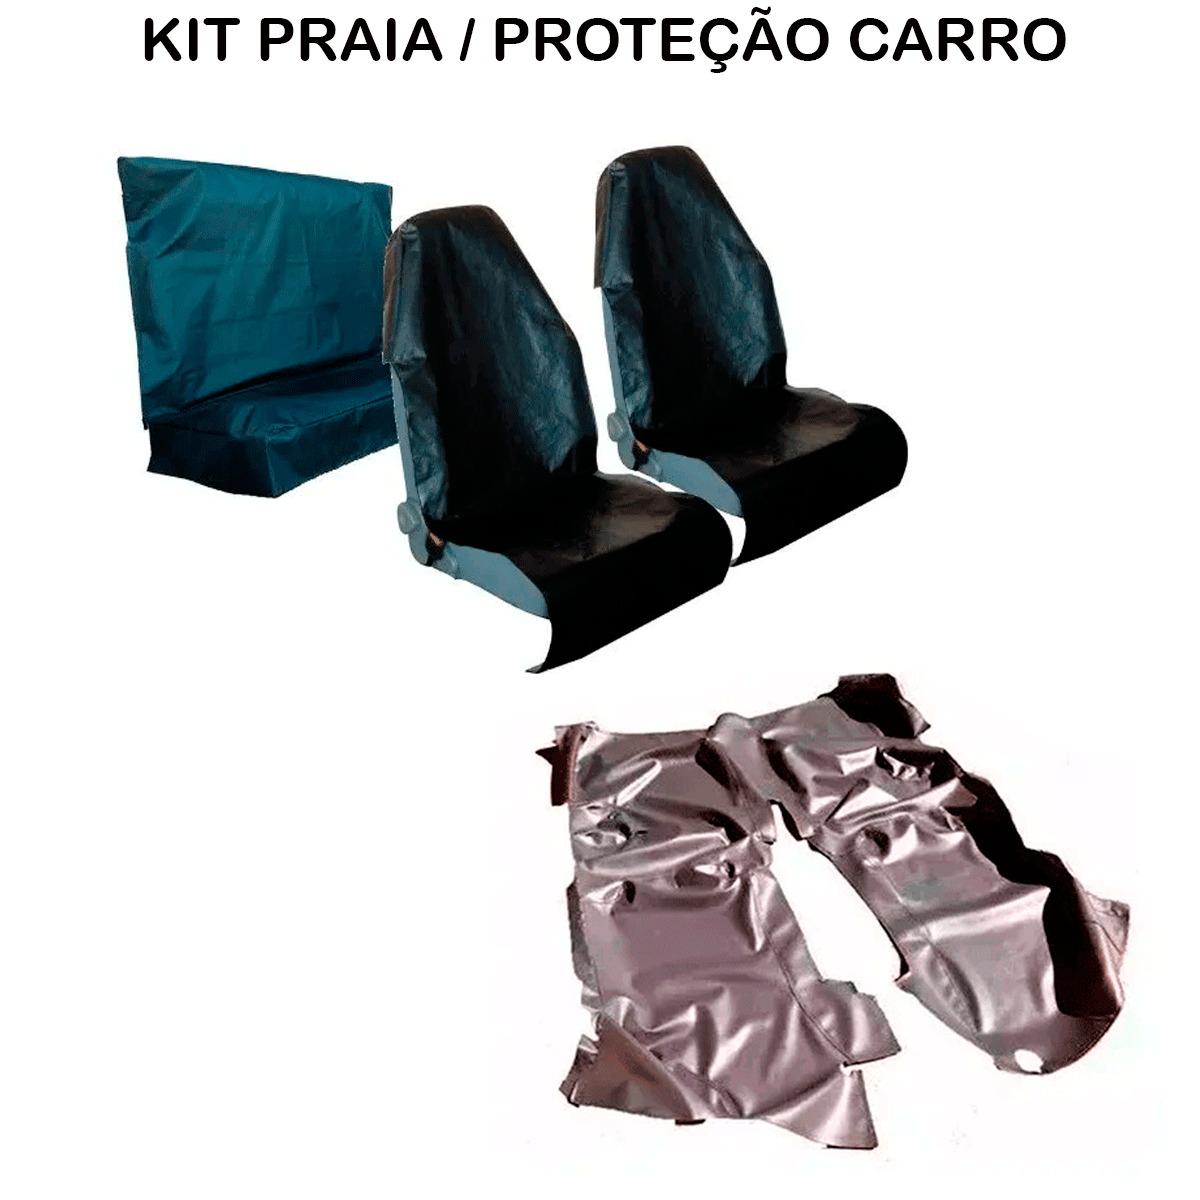 Tapete Em Vinil Fiat Palio Weekend + Capa Banco Protecao Banco Areia Suor Academia